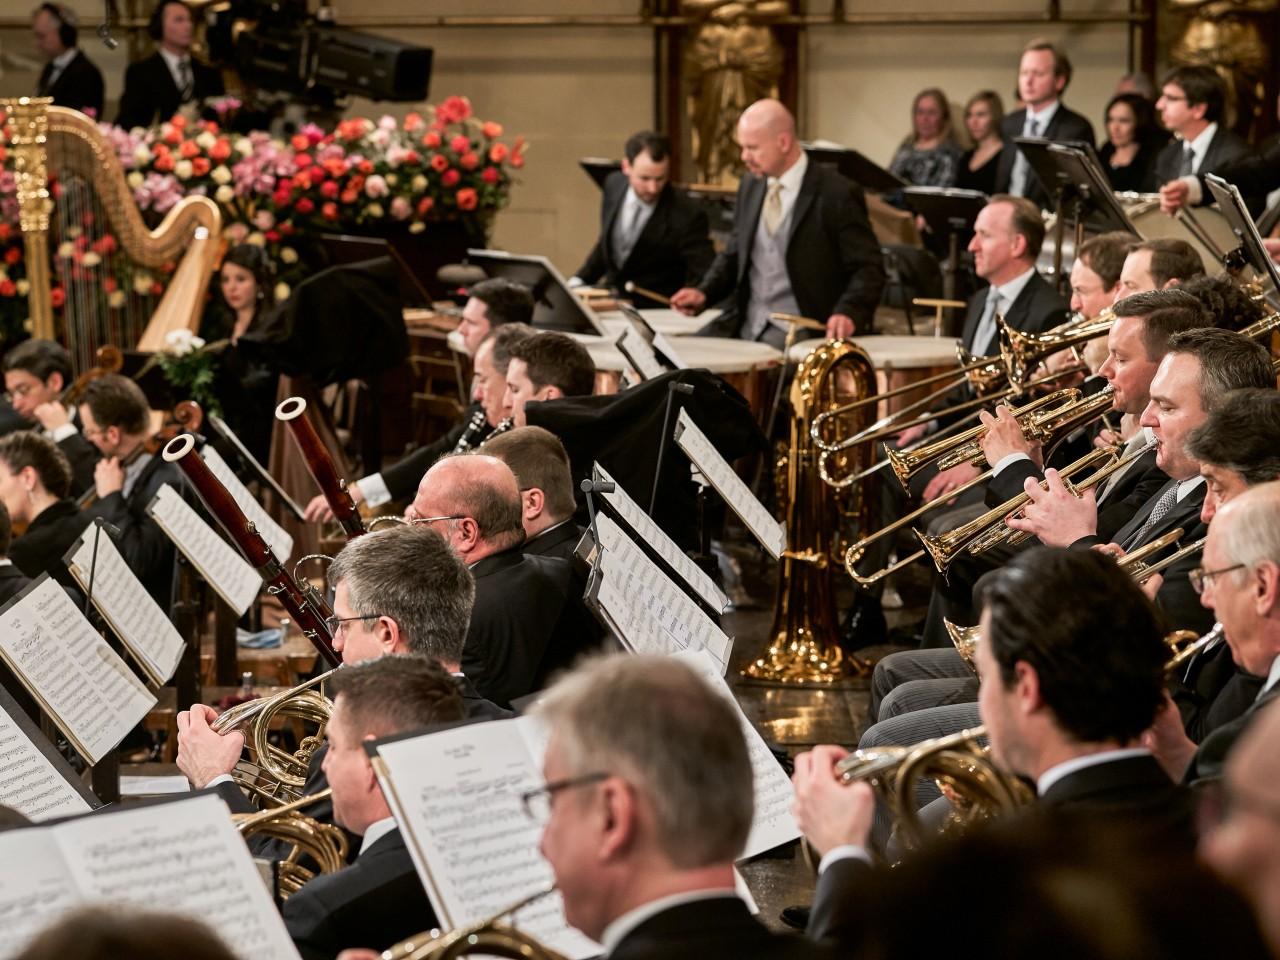 Badenia Advent Music Festival for Choirs & Orchestras